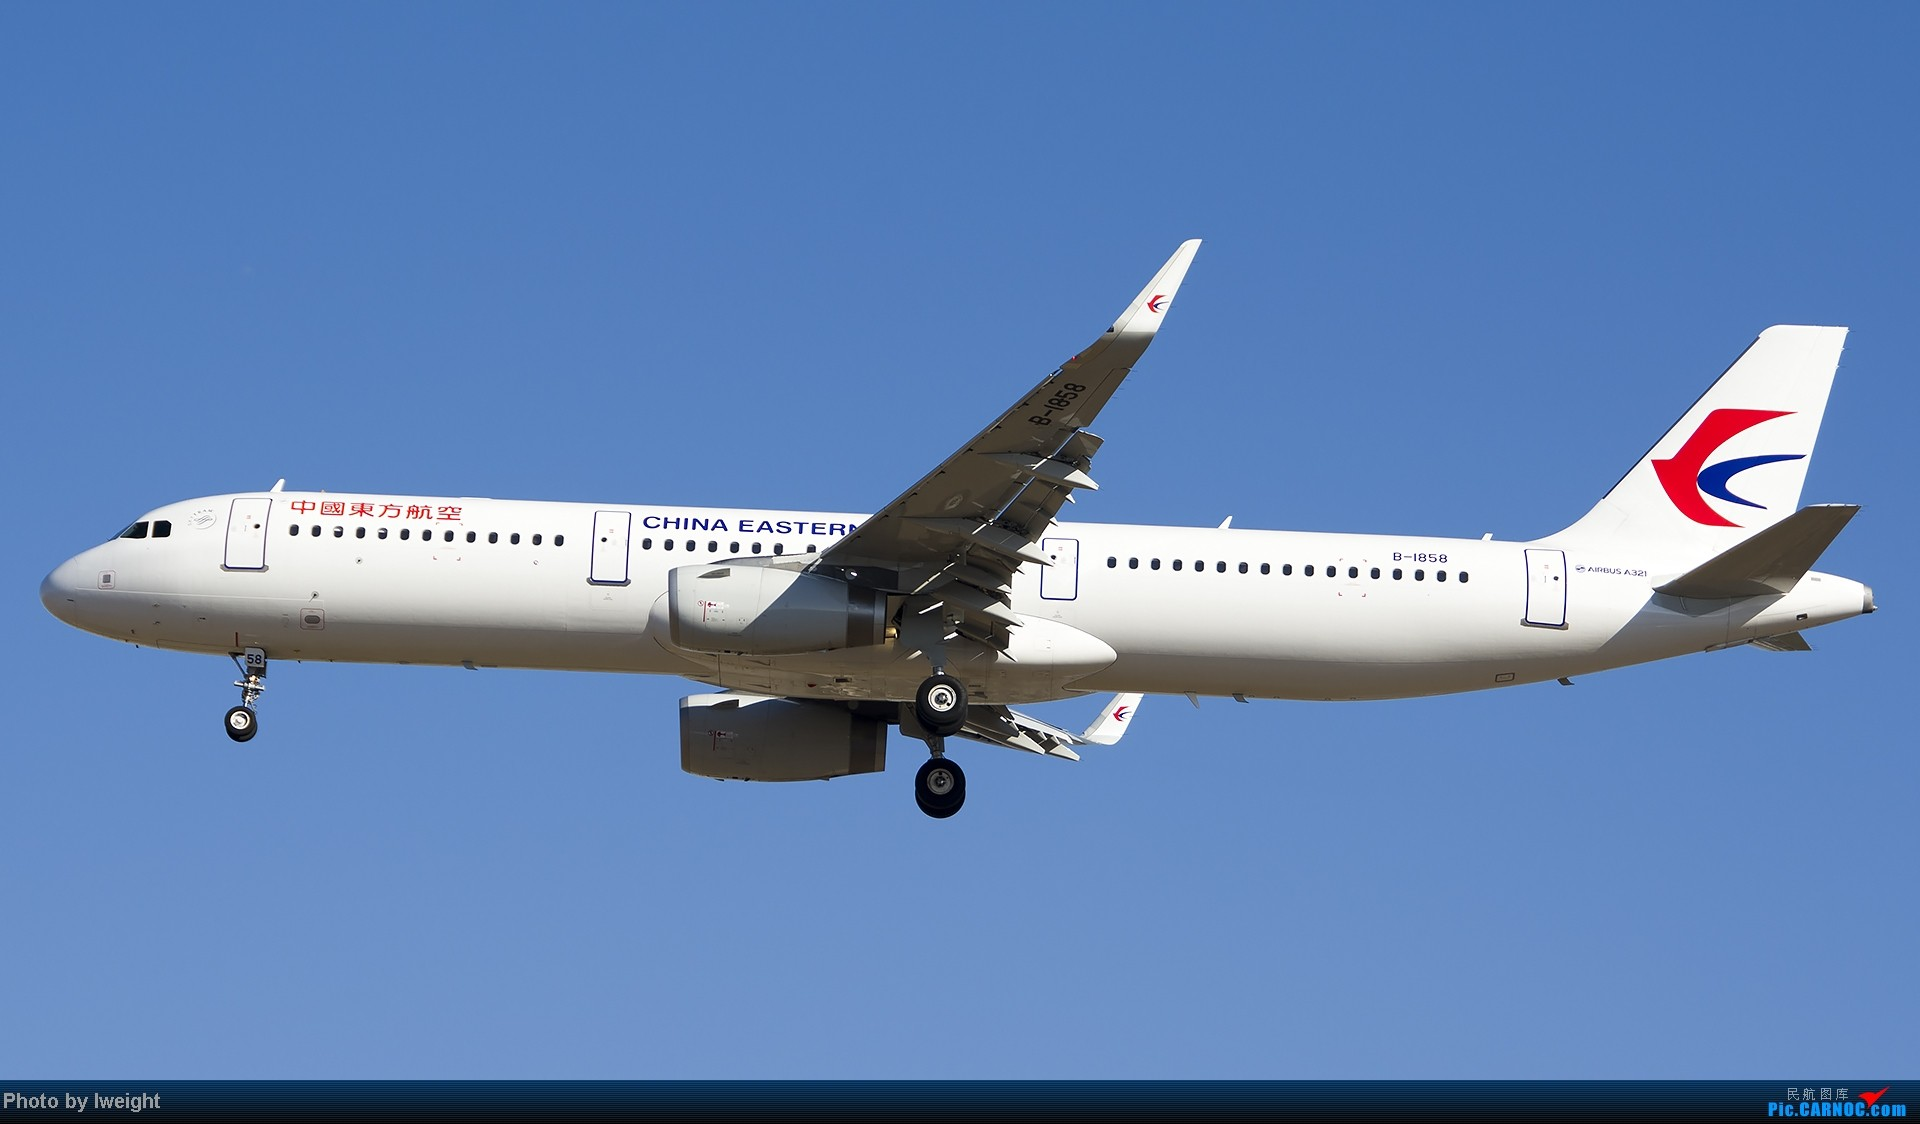 Re:[原创]抓住APEC蓝的尾巴,再拍上一组 AIRBUS A321-200 B-1858 中国北京首都机场